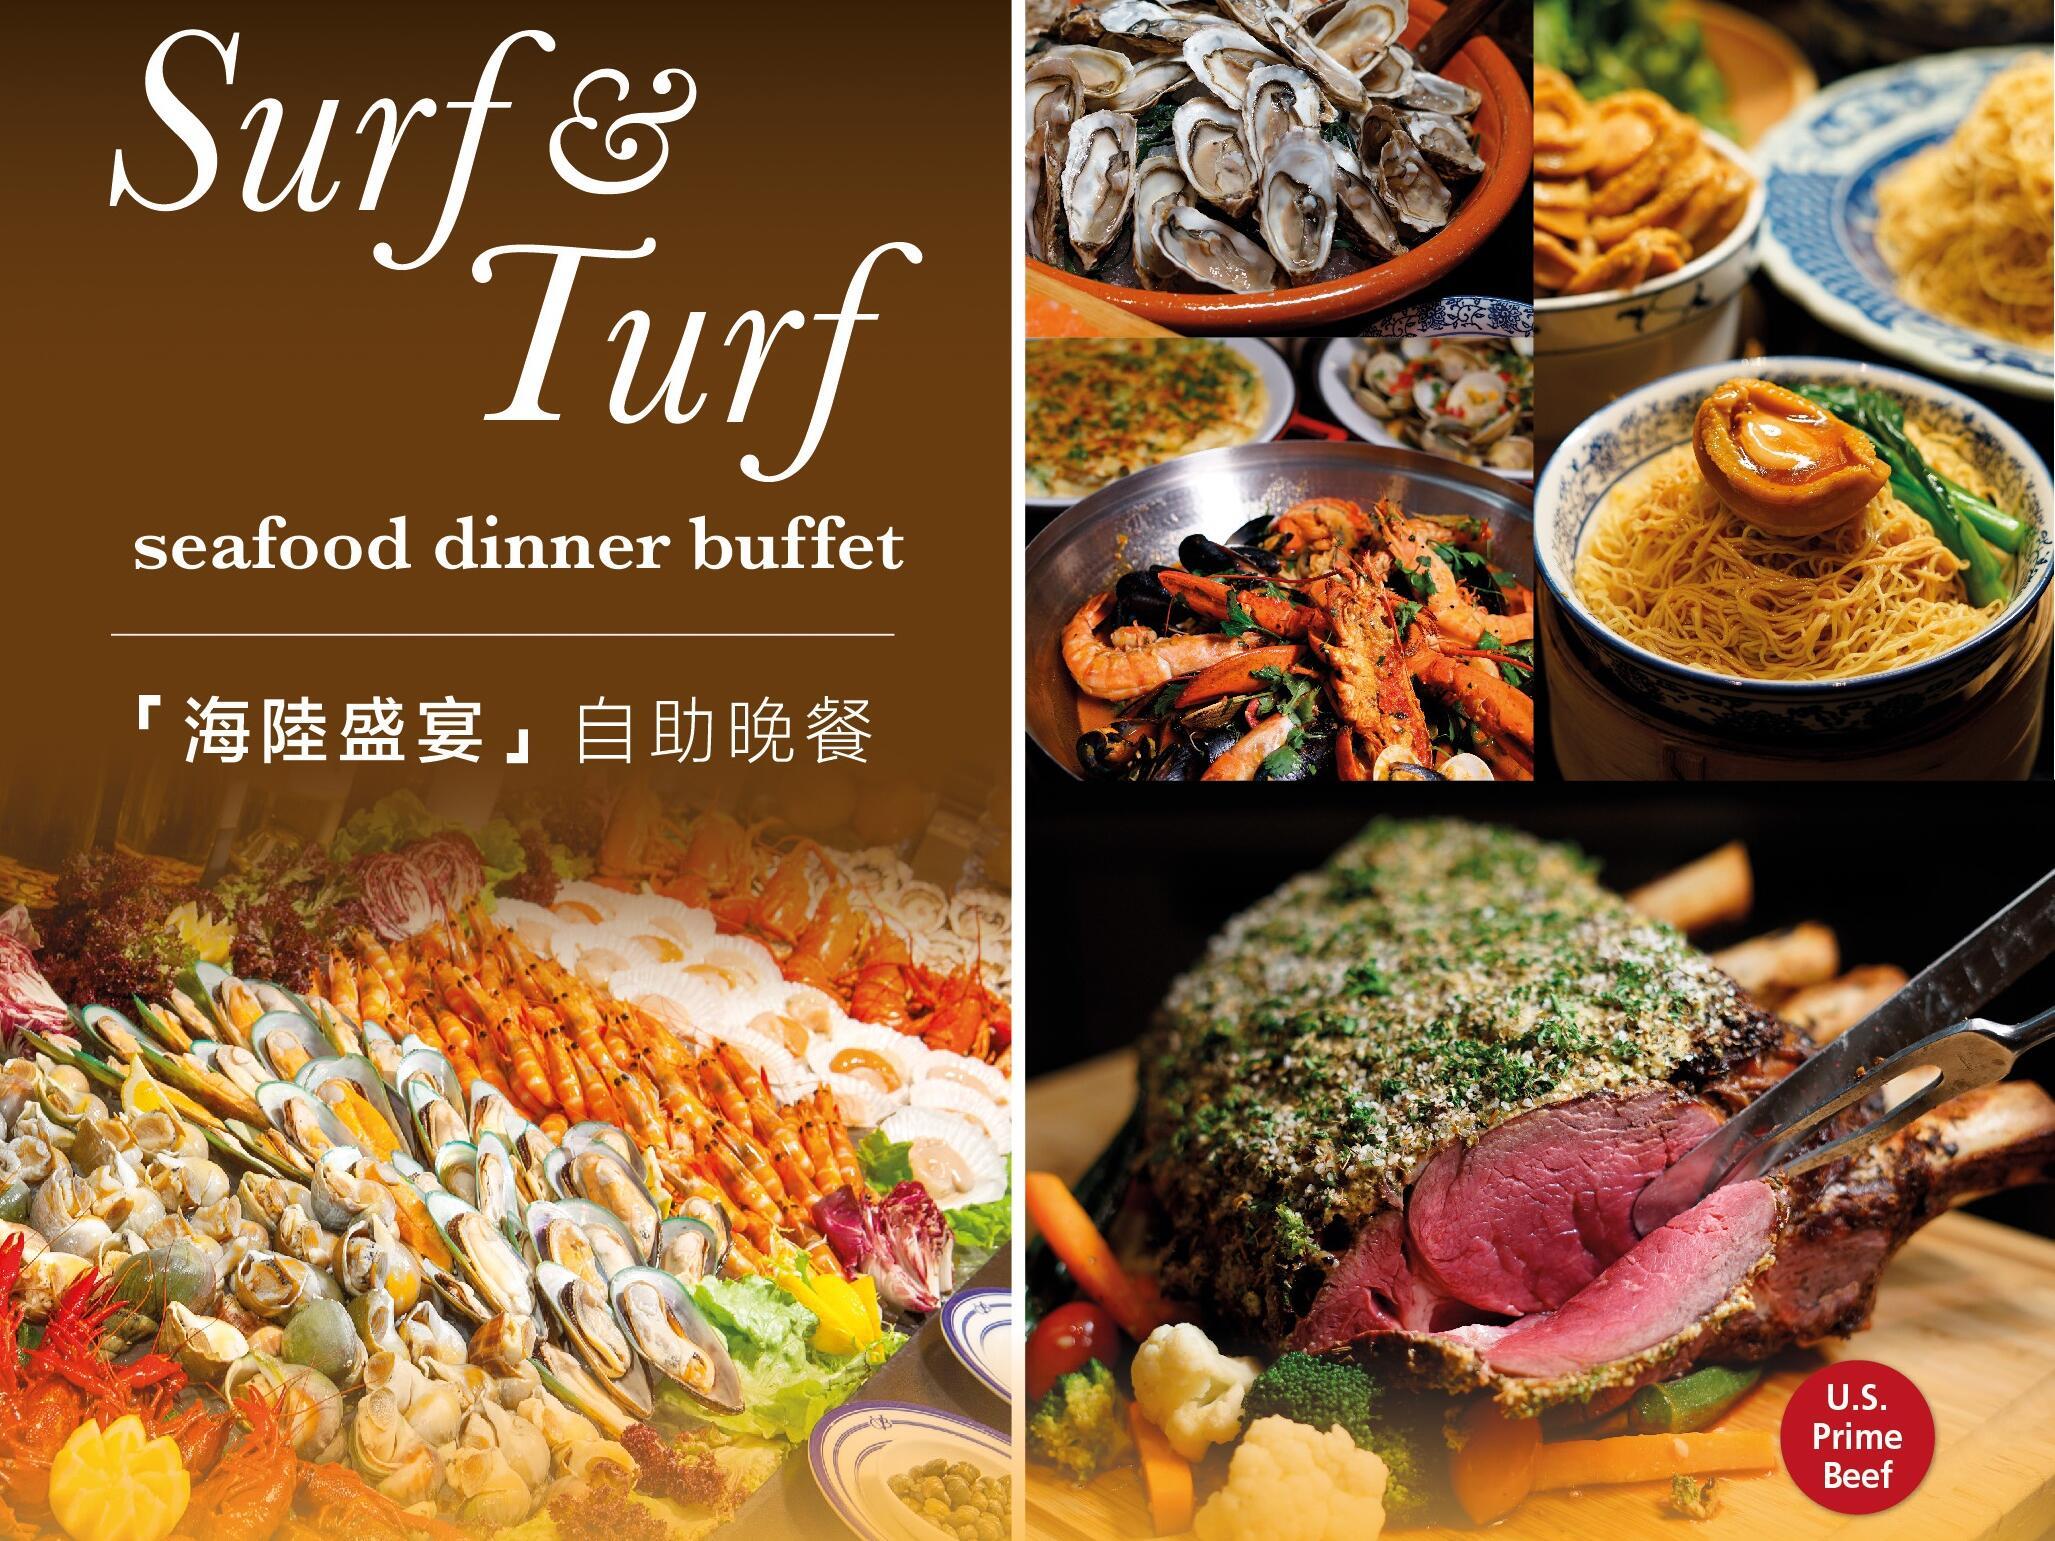 Surf and Turf seafood dinner breakfast at Artyzen Grand Lapa Hotel Macau